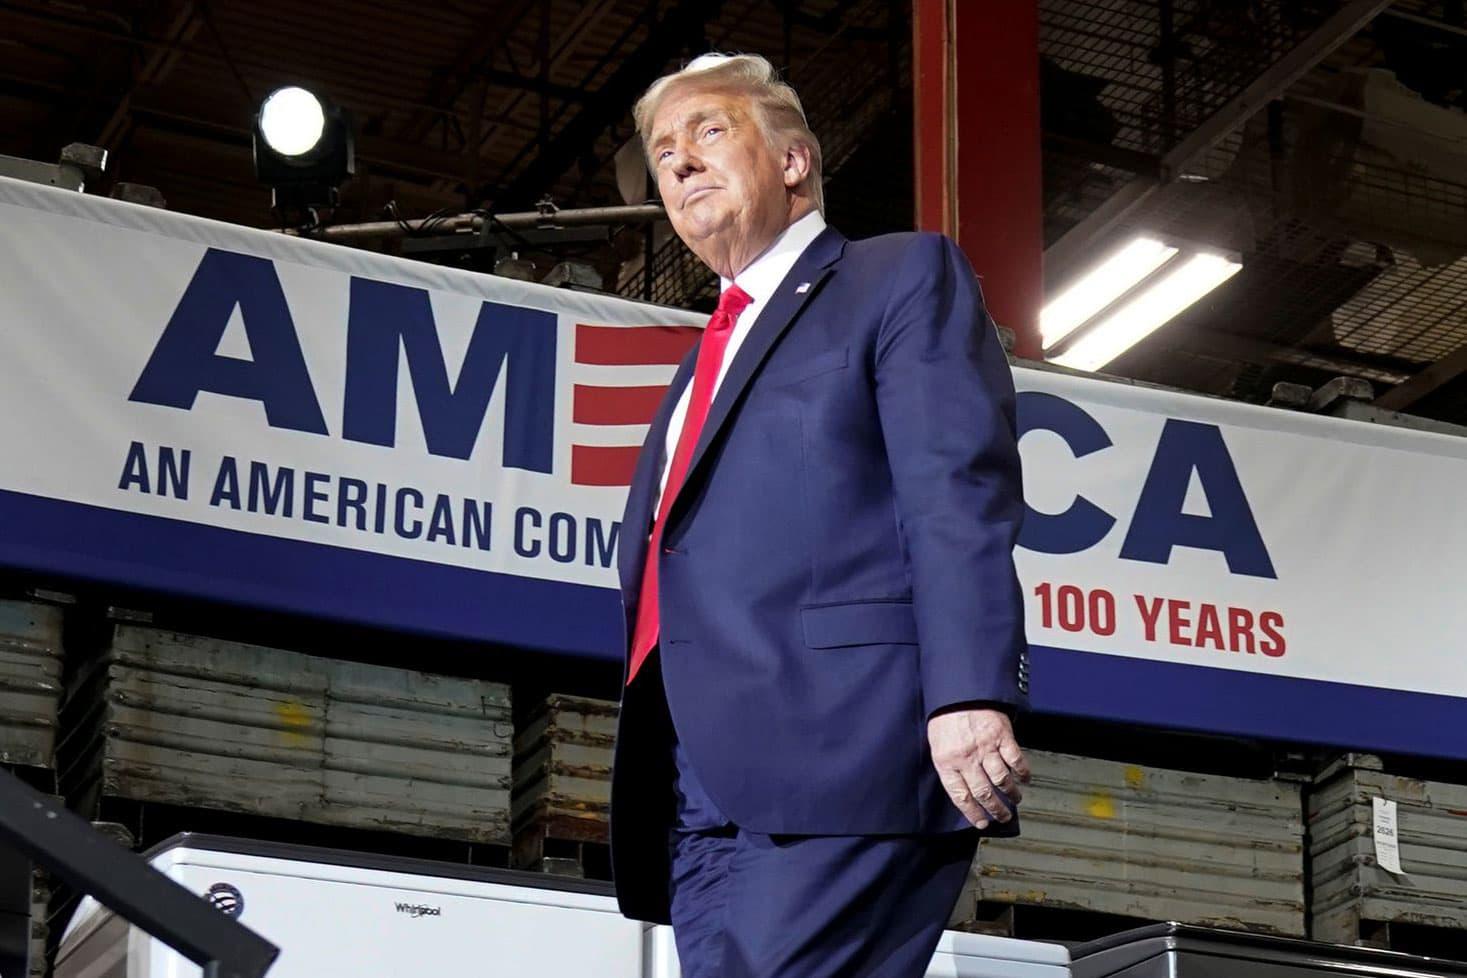 Trump says he signed order reimposing 10% aluminum tariffs on Canada